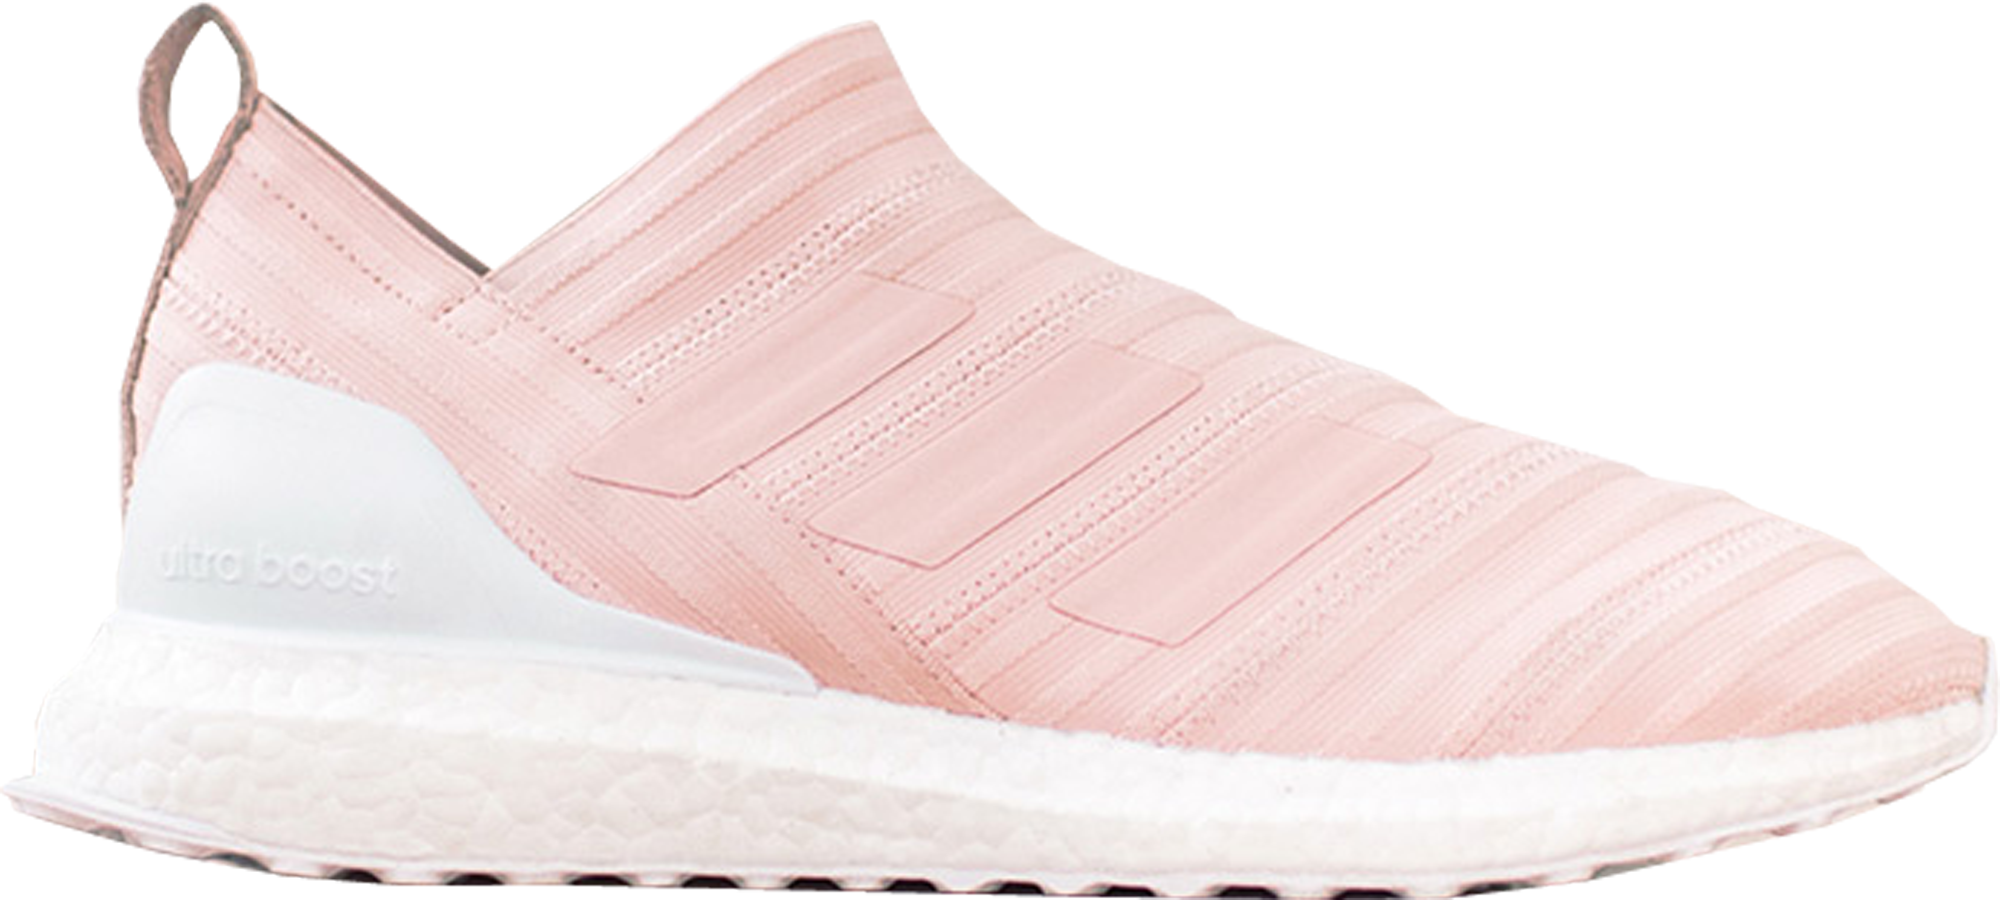 306dd3e0f643 ... Footwear Ronnie Fieg x adidas Nemeziz Tango 17+ Ultra Boost KITH  Flamingos ...